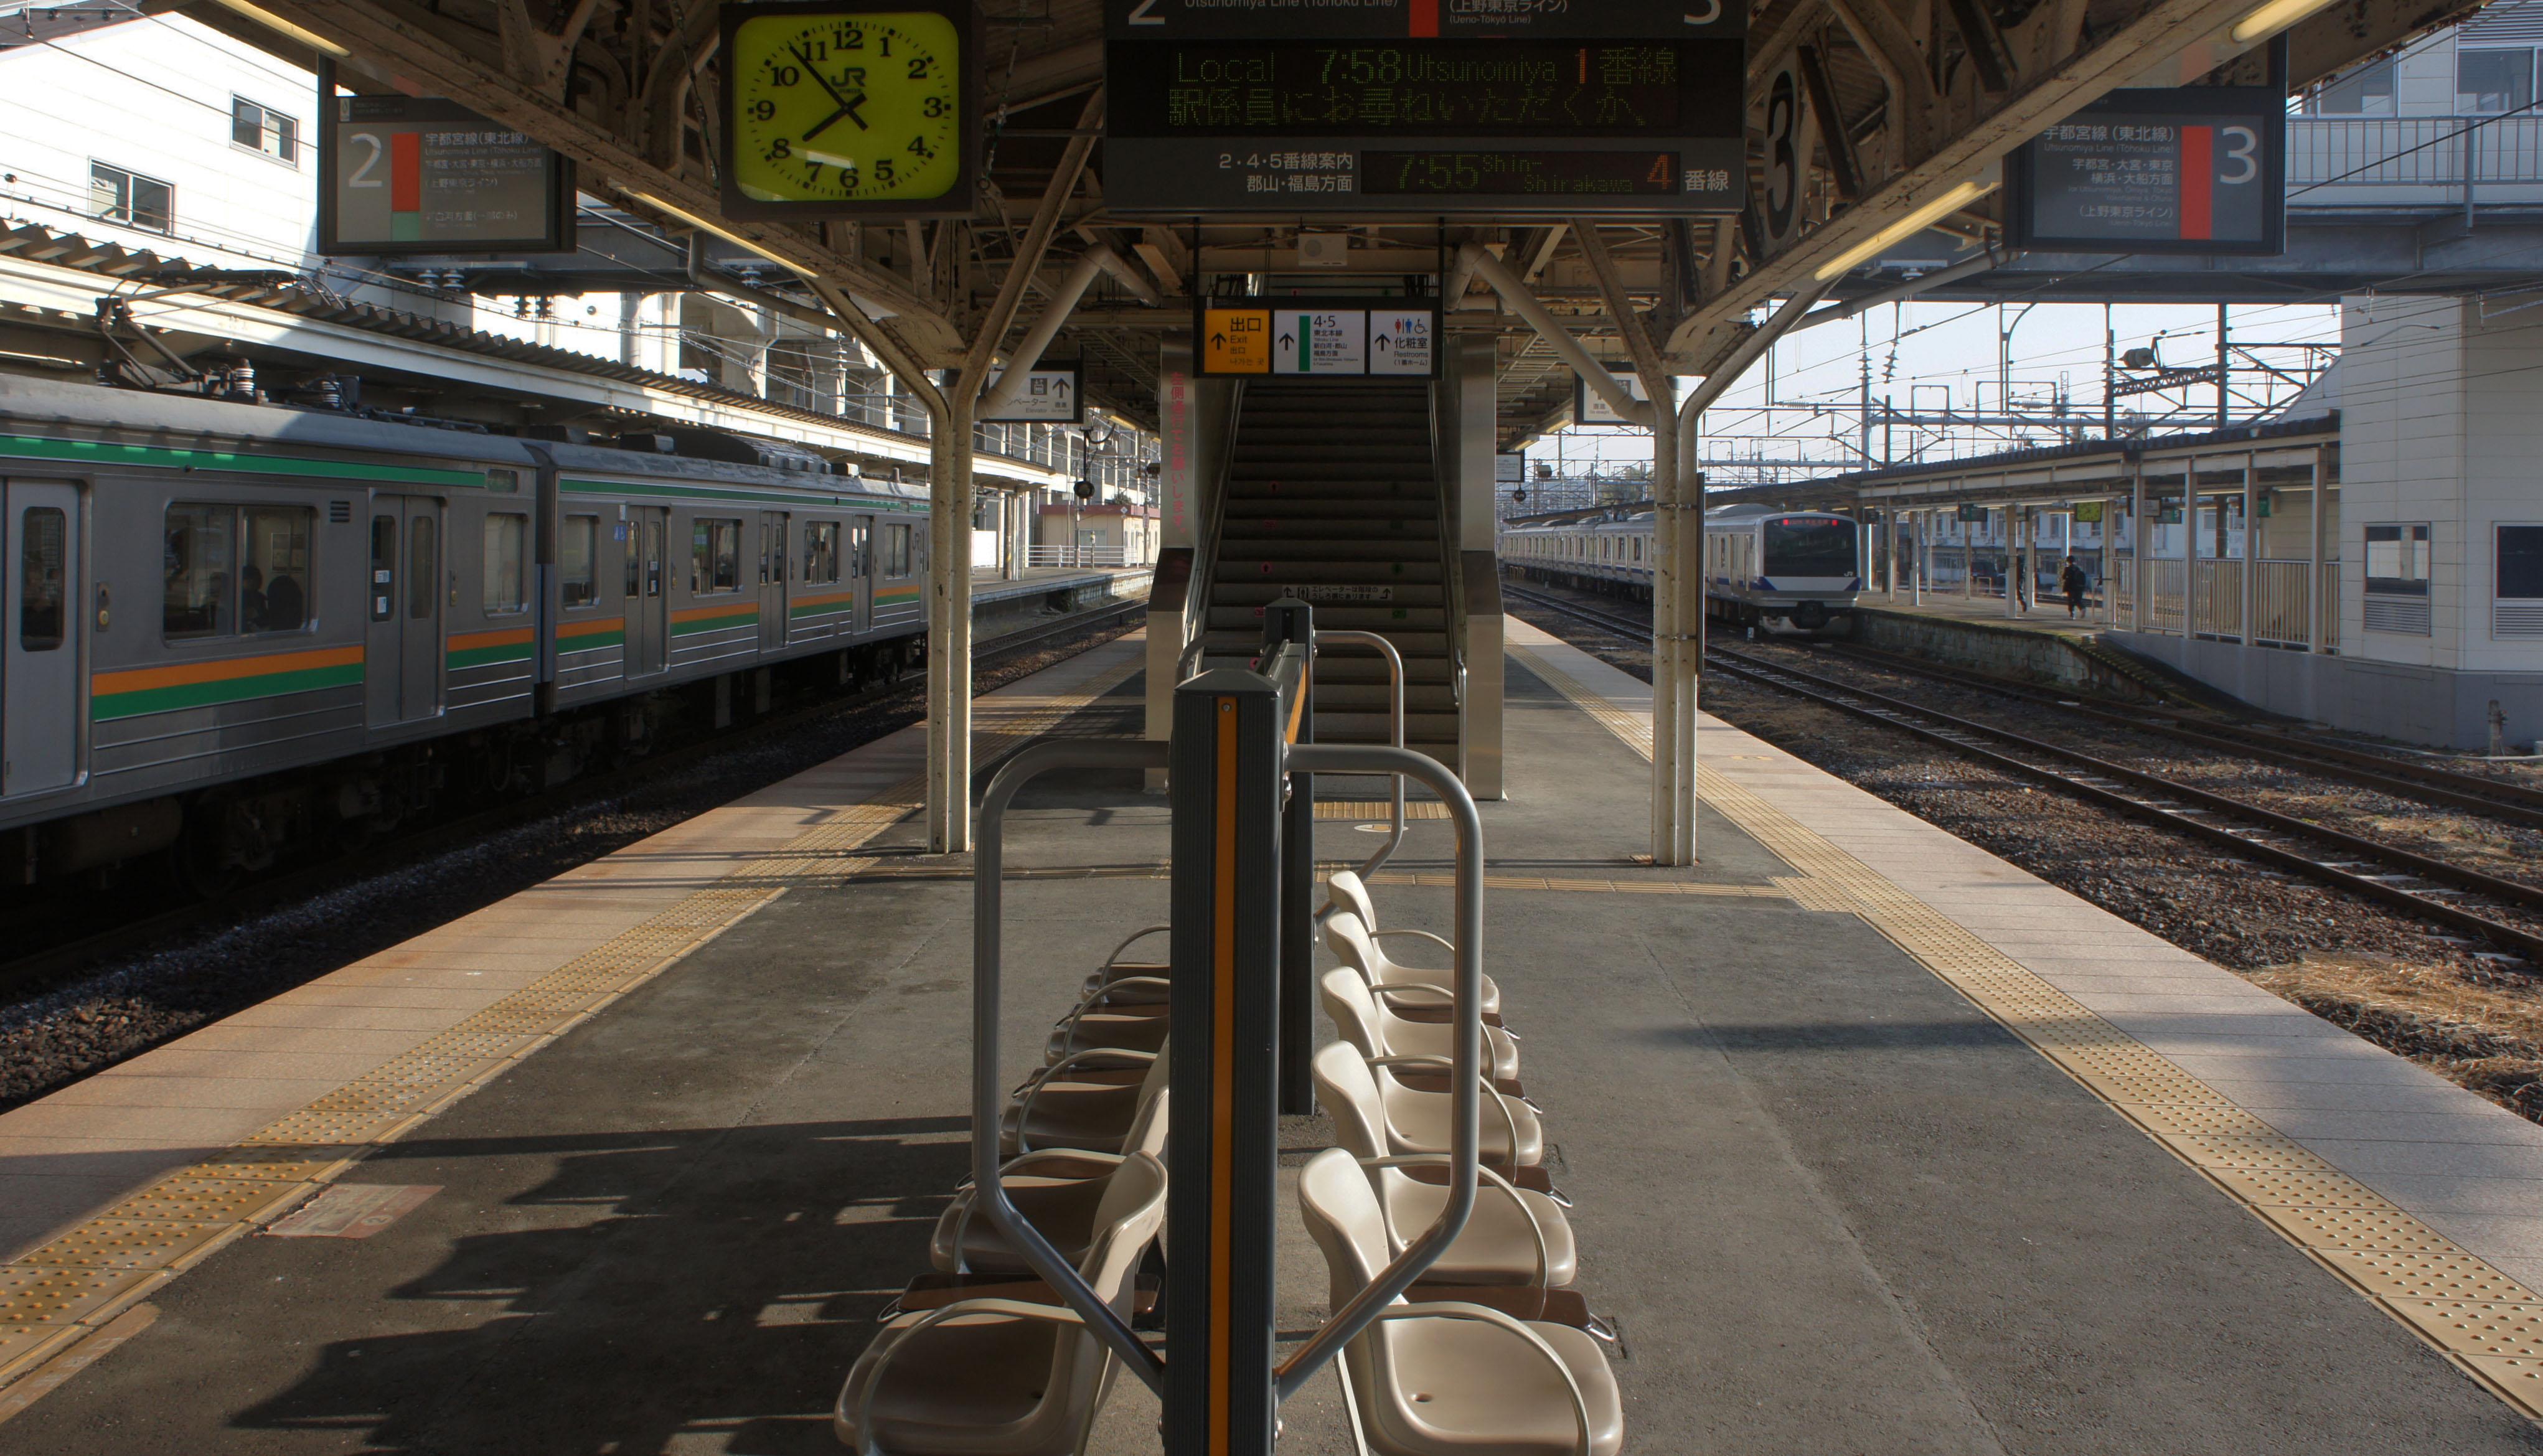 https://upload.wikimedia.org/wikipedia/commons/3/30/JR_Tohoku-Main-Line_Kuroiso_Station_Platform_2%E3%83%BB3.jpg